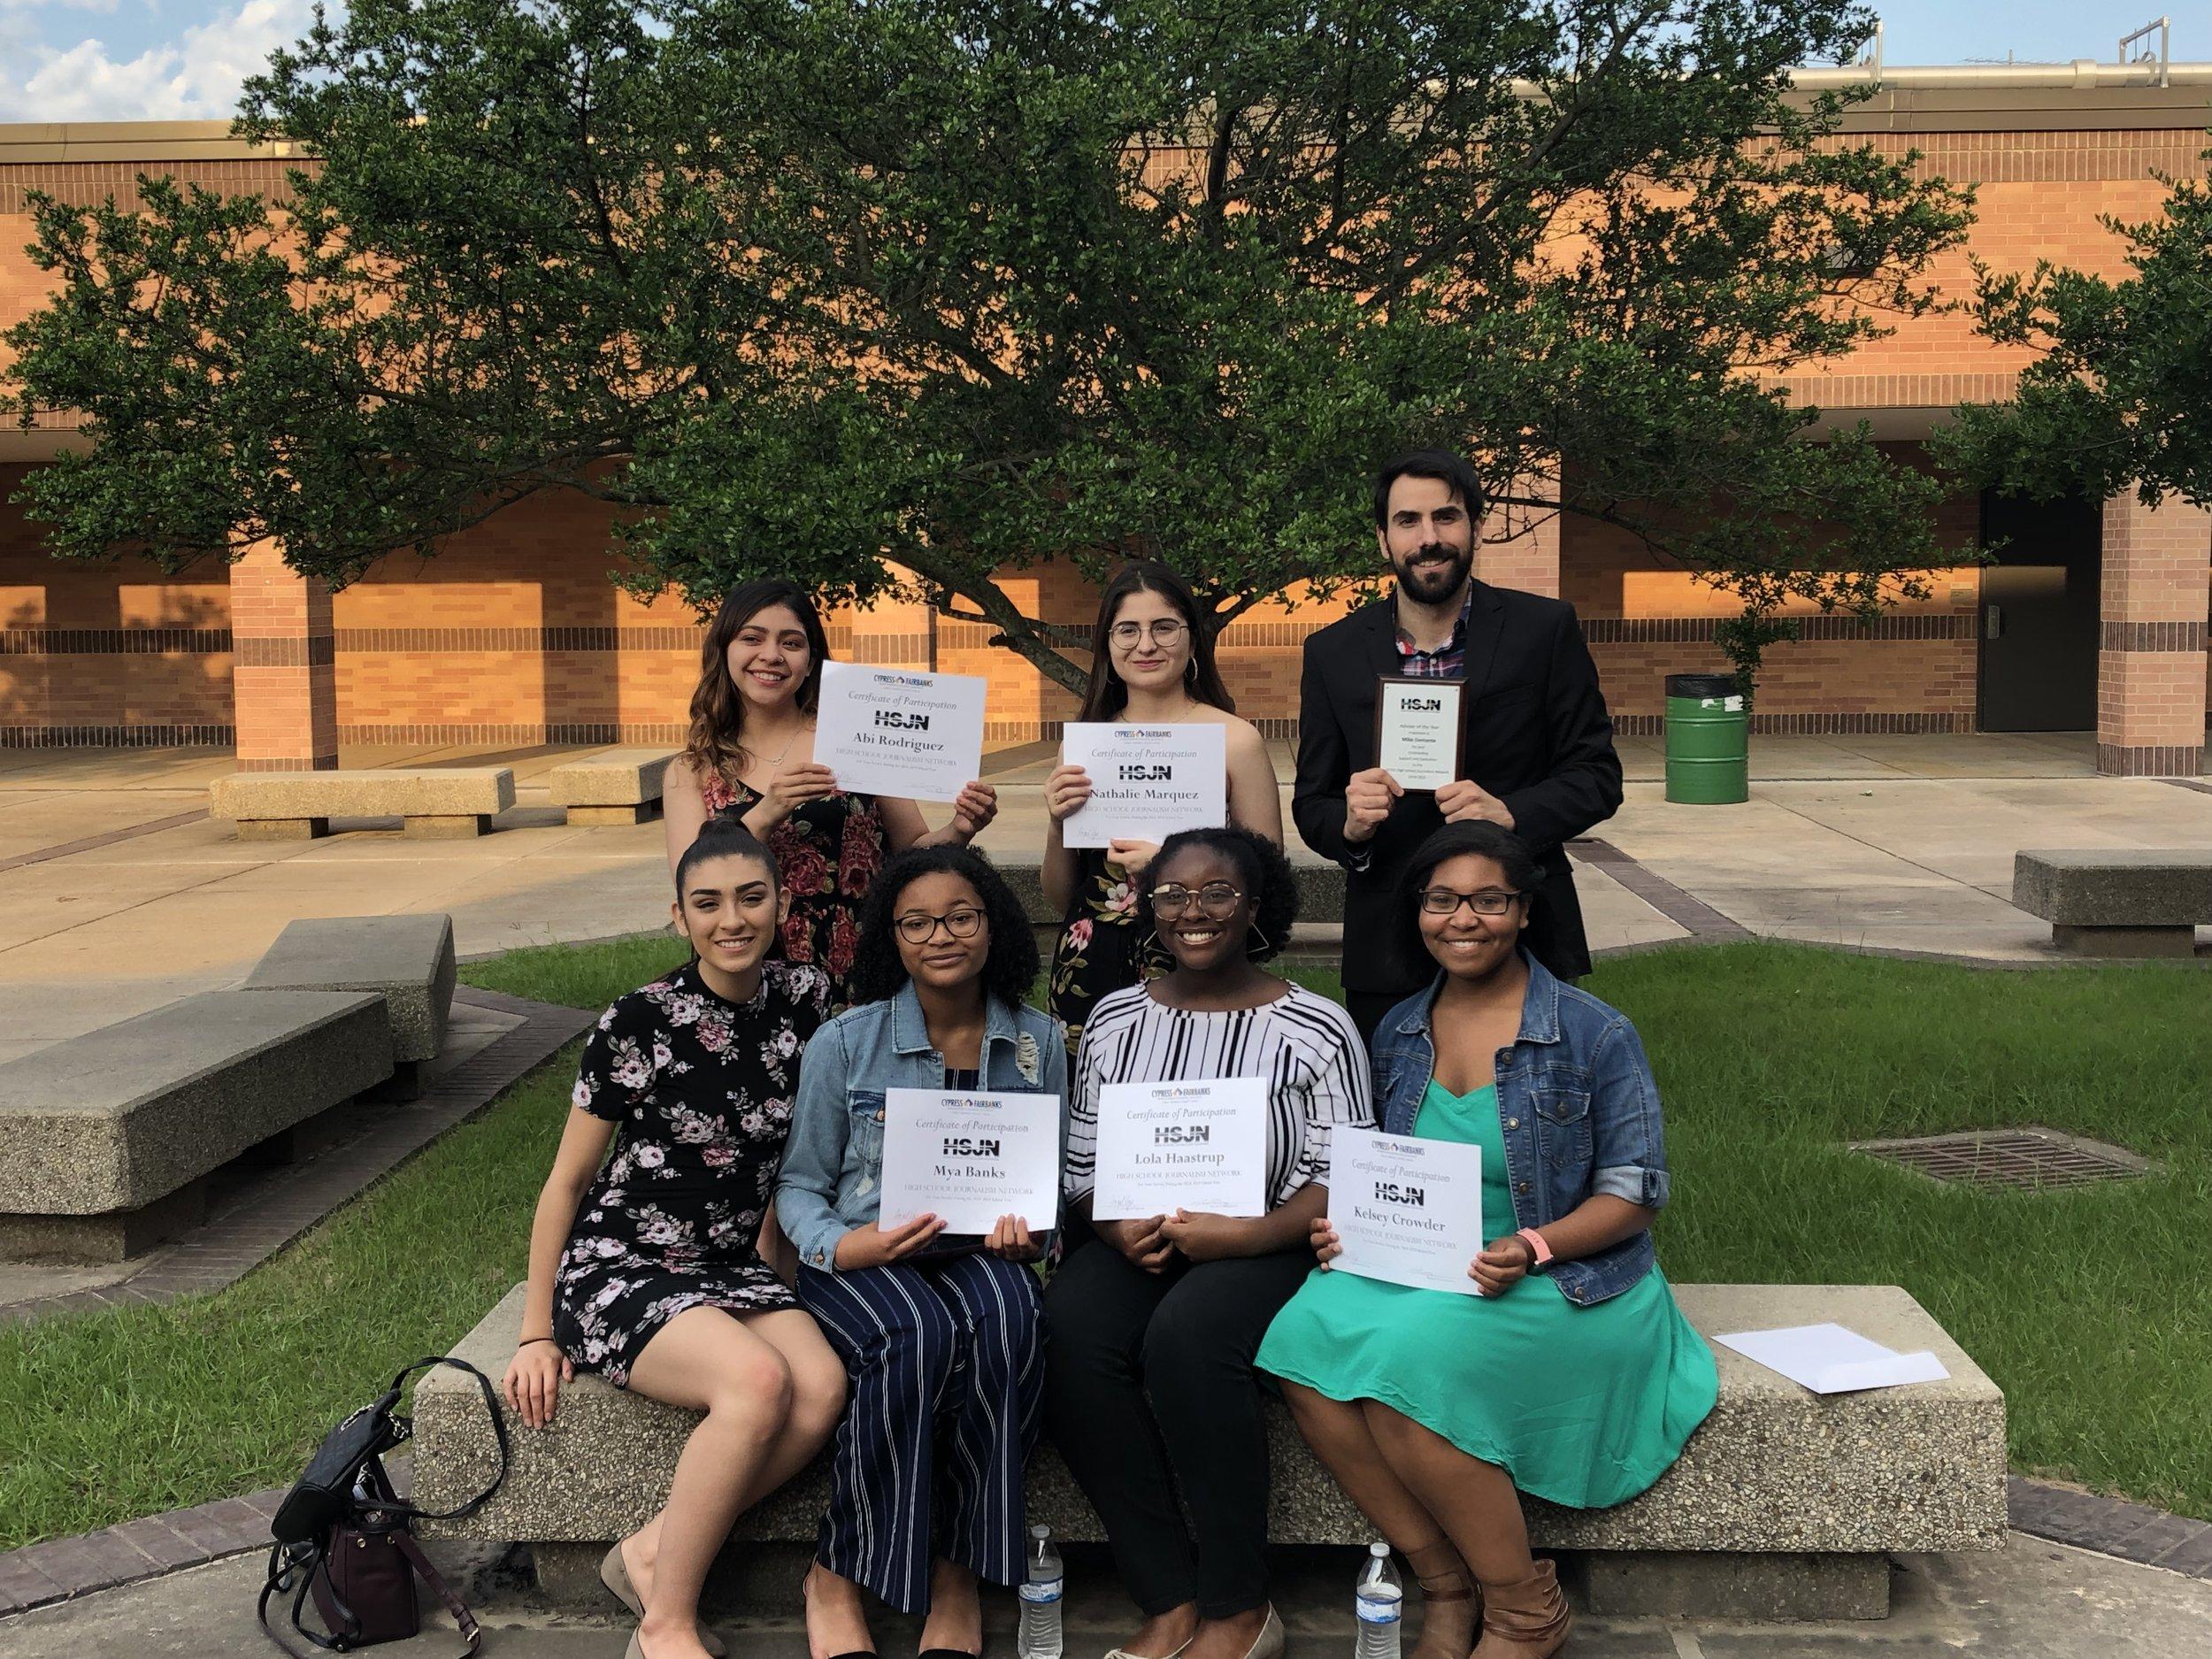 The journalism department receives awards at HSJN. (Noah Spencer)